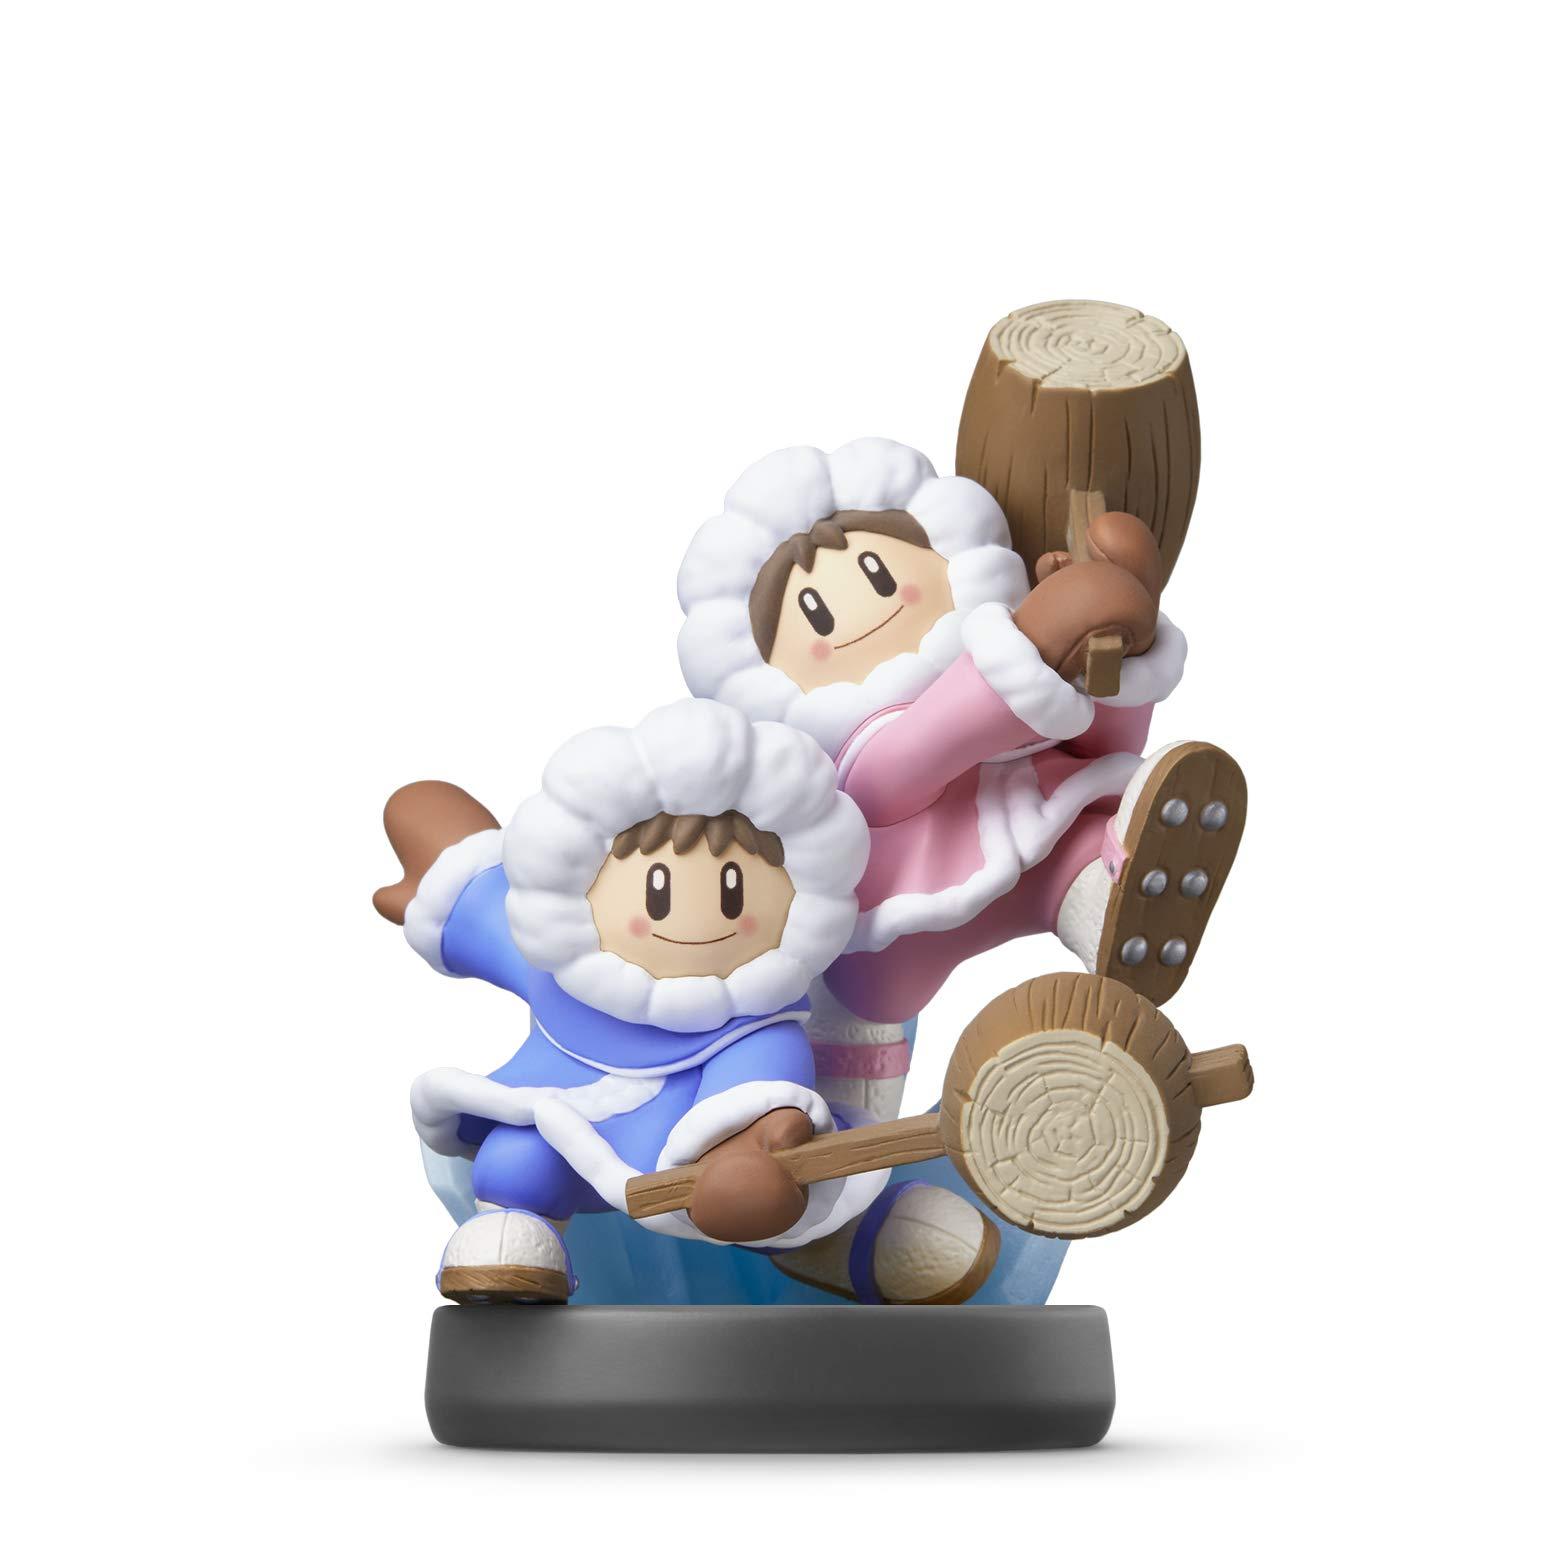 Nintendo amiibo - Ice Climbers - Super Smash Bros. Series